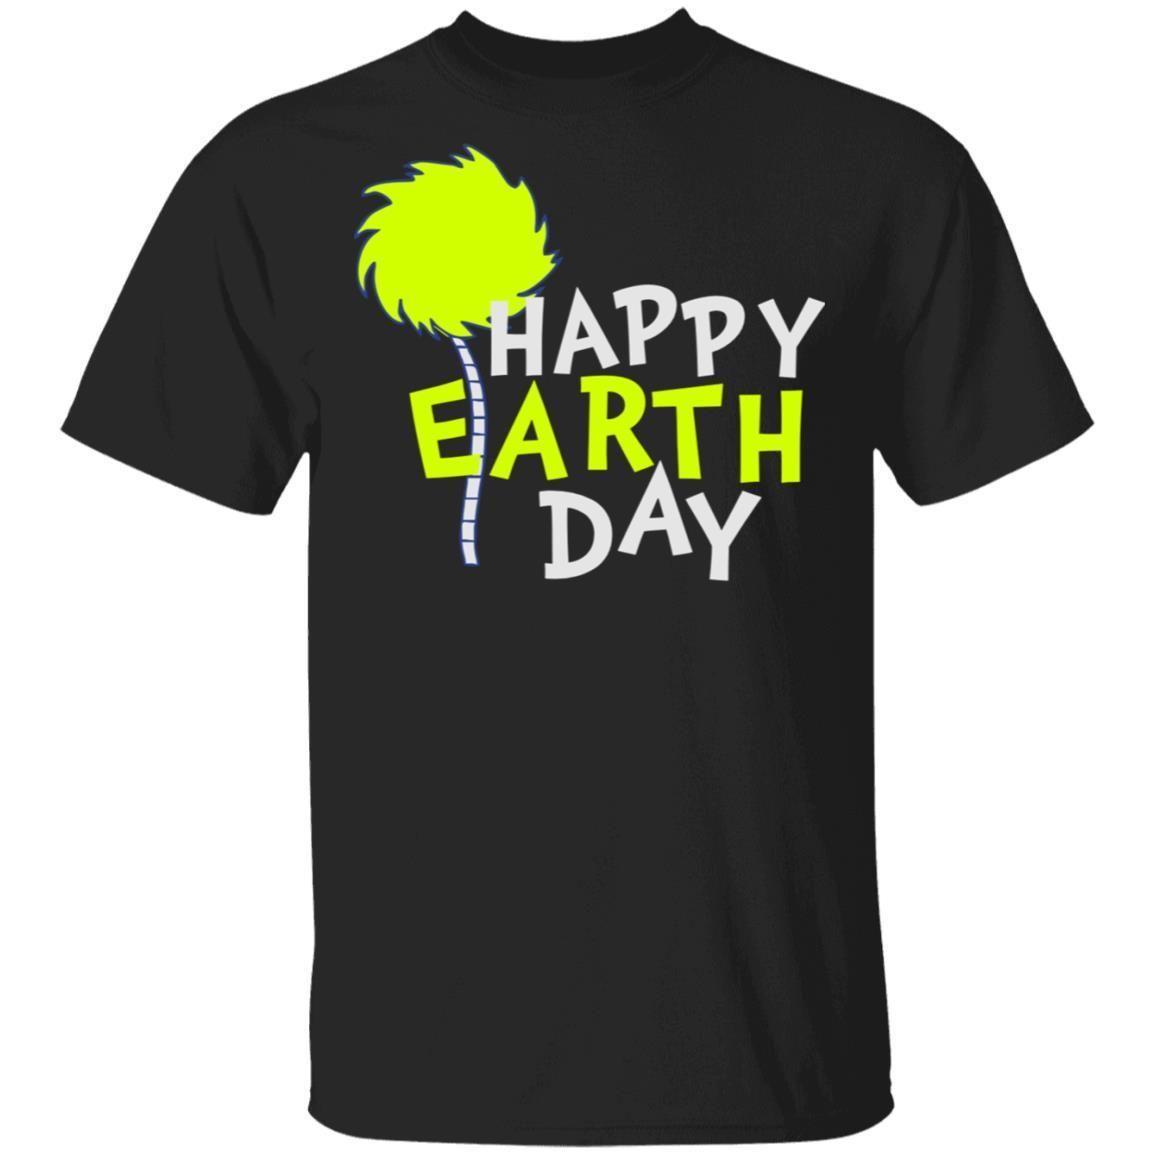 Happy Earth Day T Shirt G500 Gildan 5 3 Oz T Shirt Navy Xl In 2020 Happy Earth Shirts T Shirt